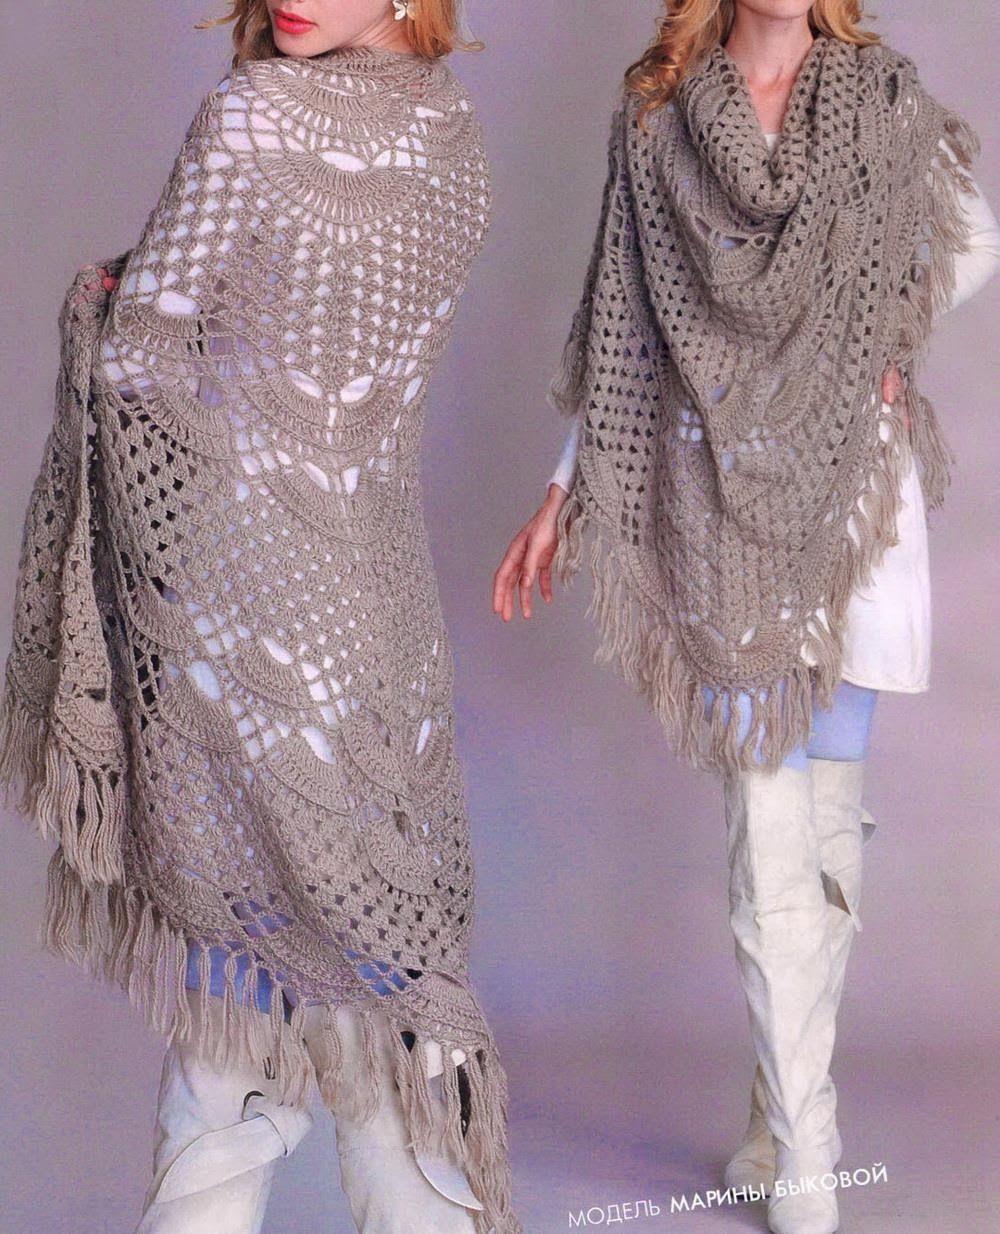 Crochet Shawl Pattern - Wonderful Shawl For Chic Women - Crochet Shawls 93300bdb7c